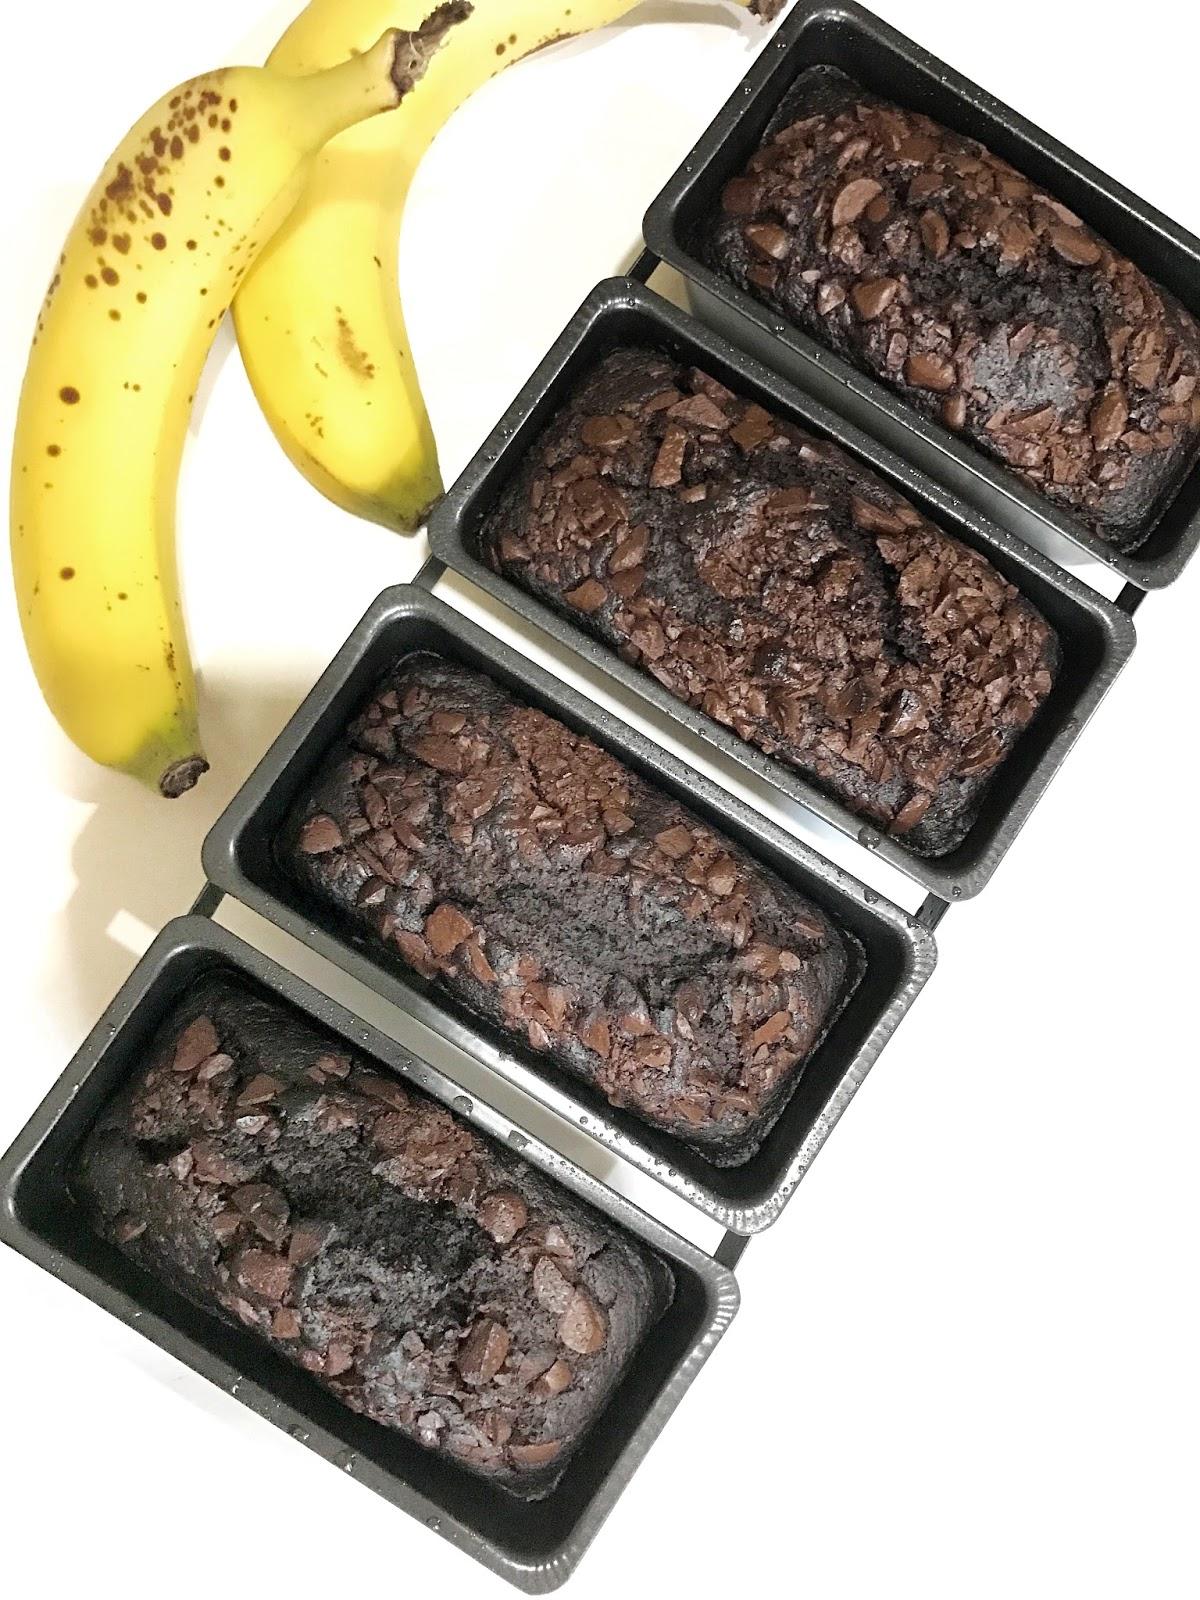 Rich Banana Bread